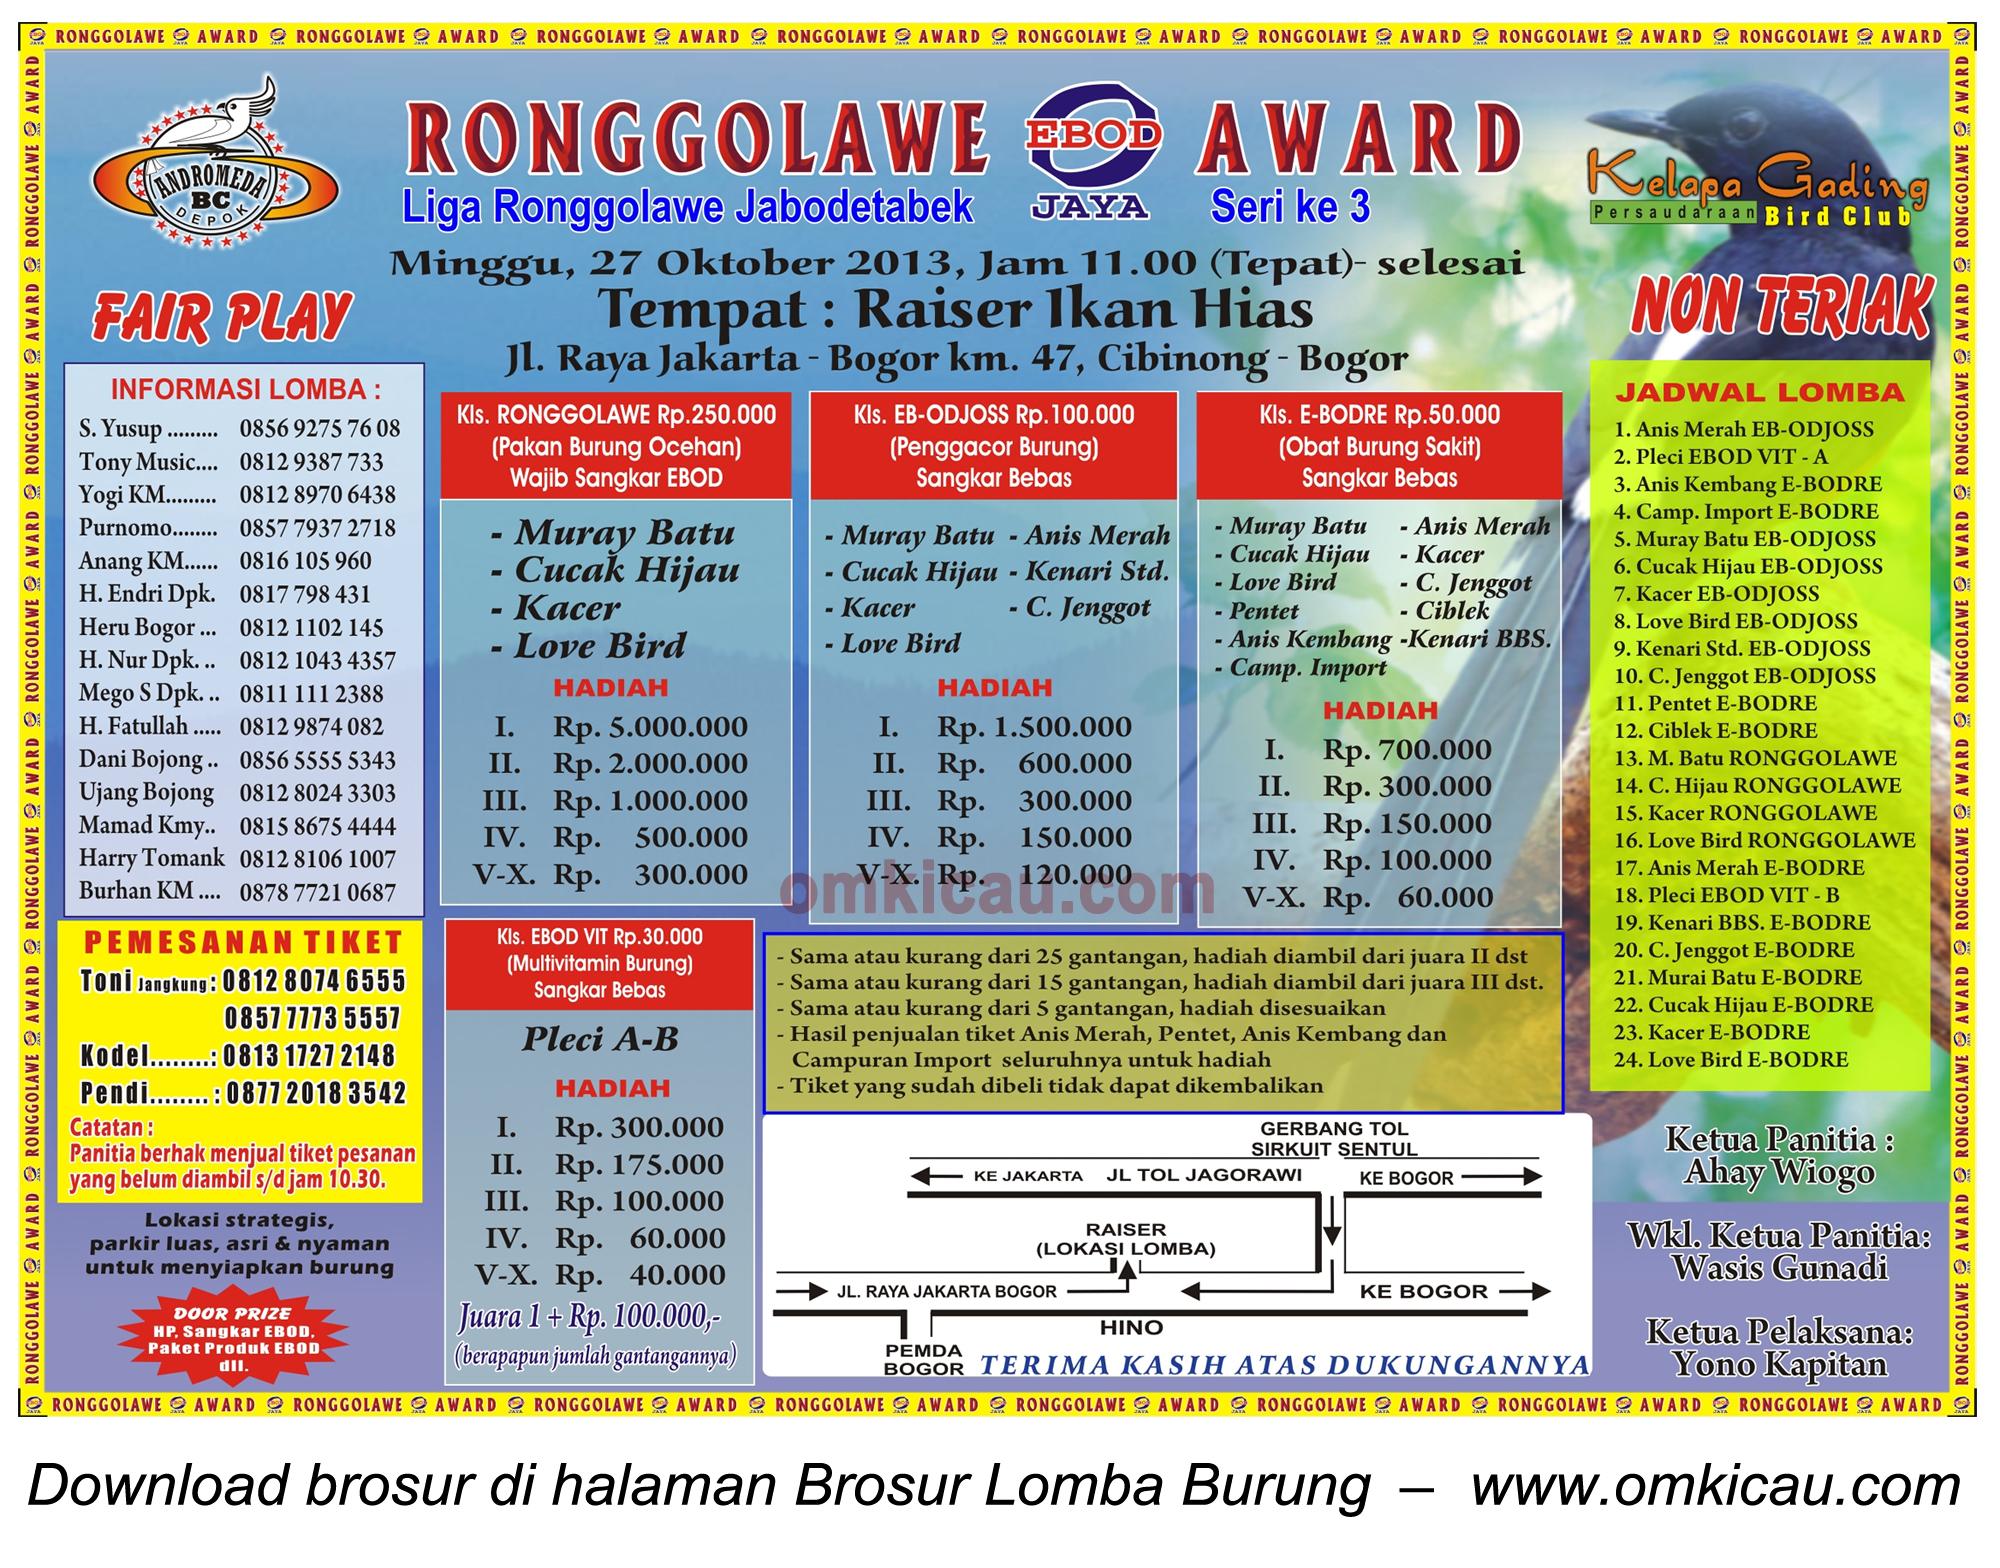 Brosur Lomba Burung Ronggolawe Award (LR Jabodetabek 3), Bogor, 27 Oktober 2013